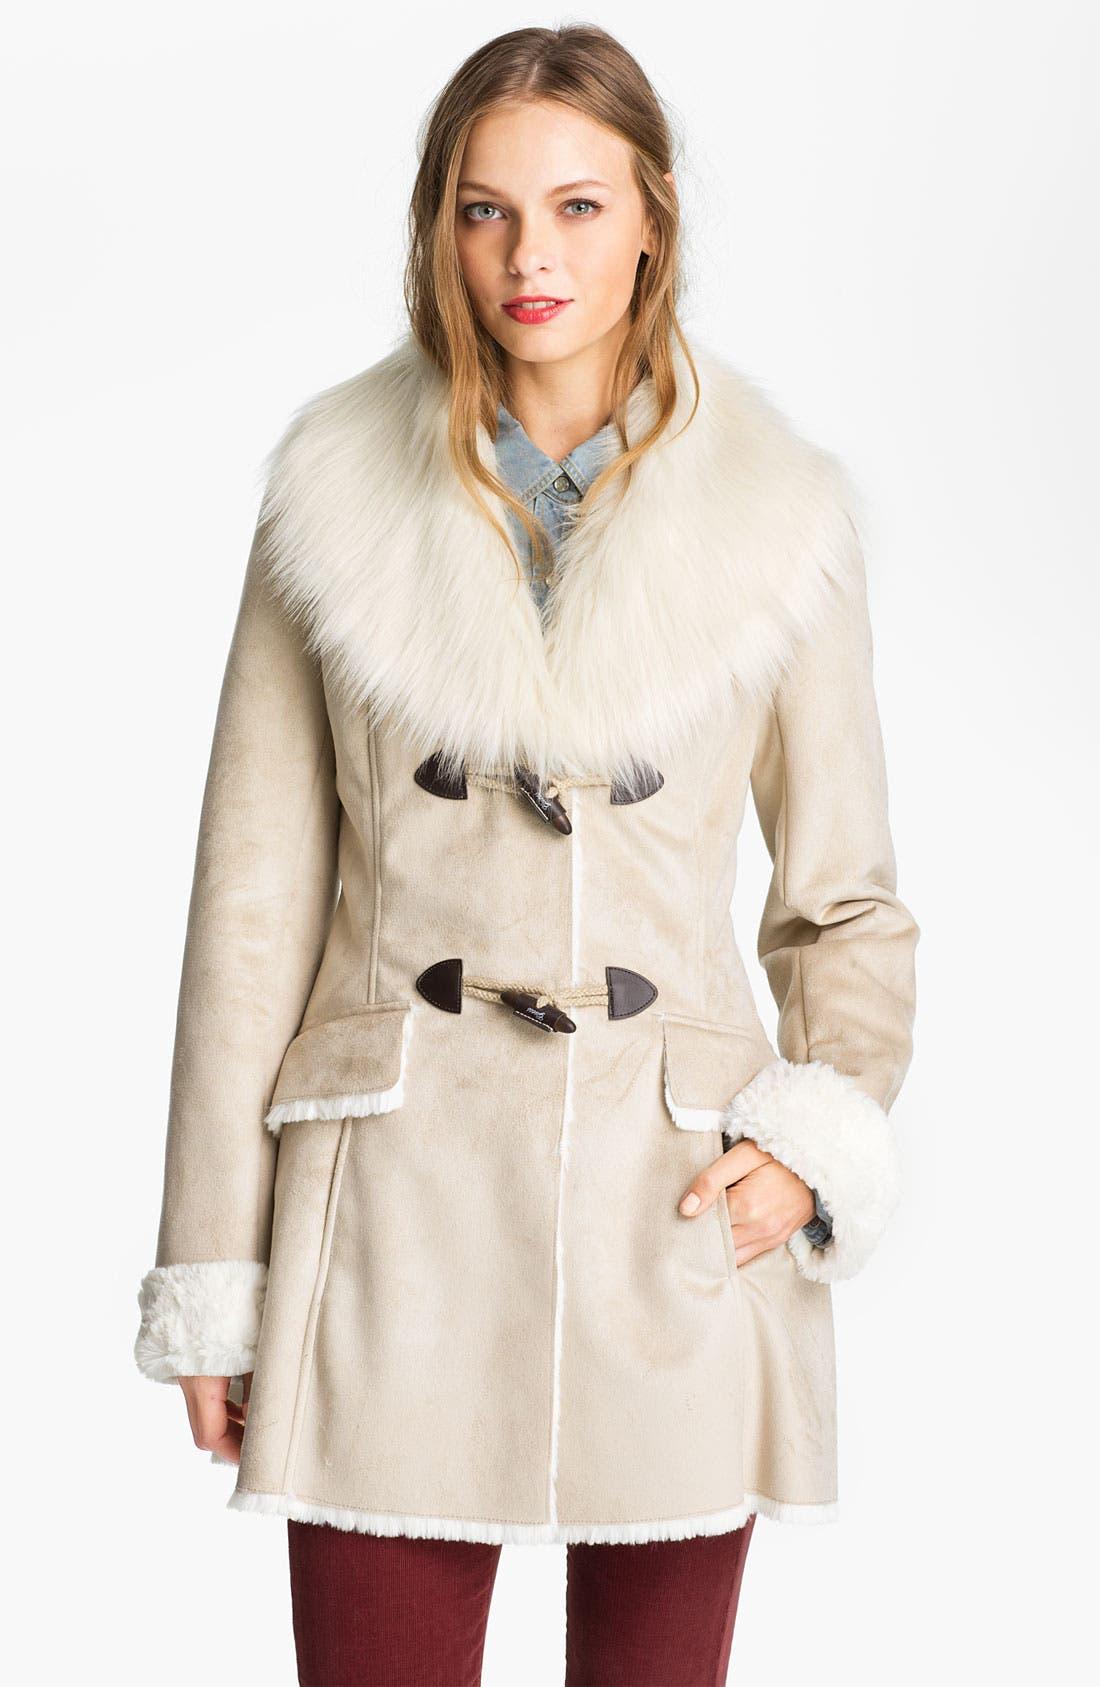 Alternate Image 1 Selected - GUESS Faux Shearling Walking Coat